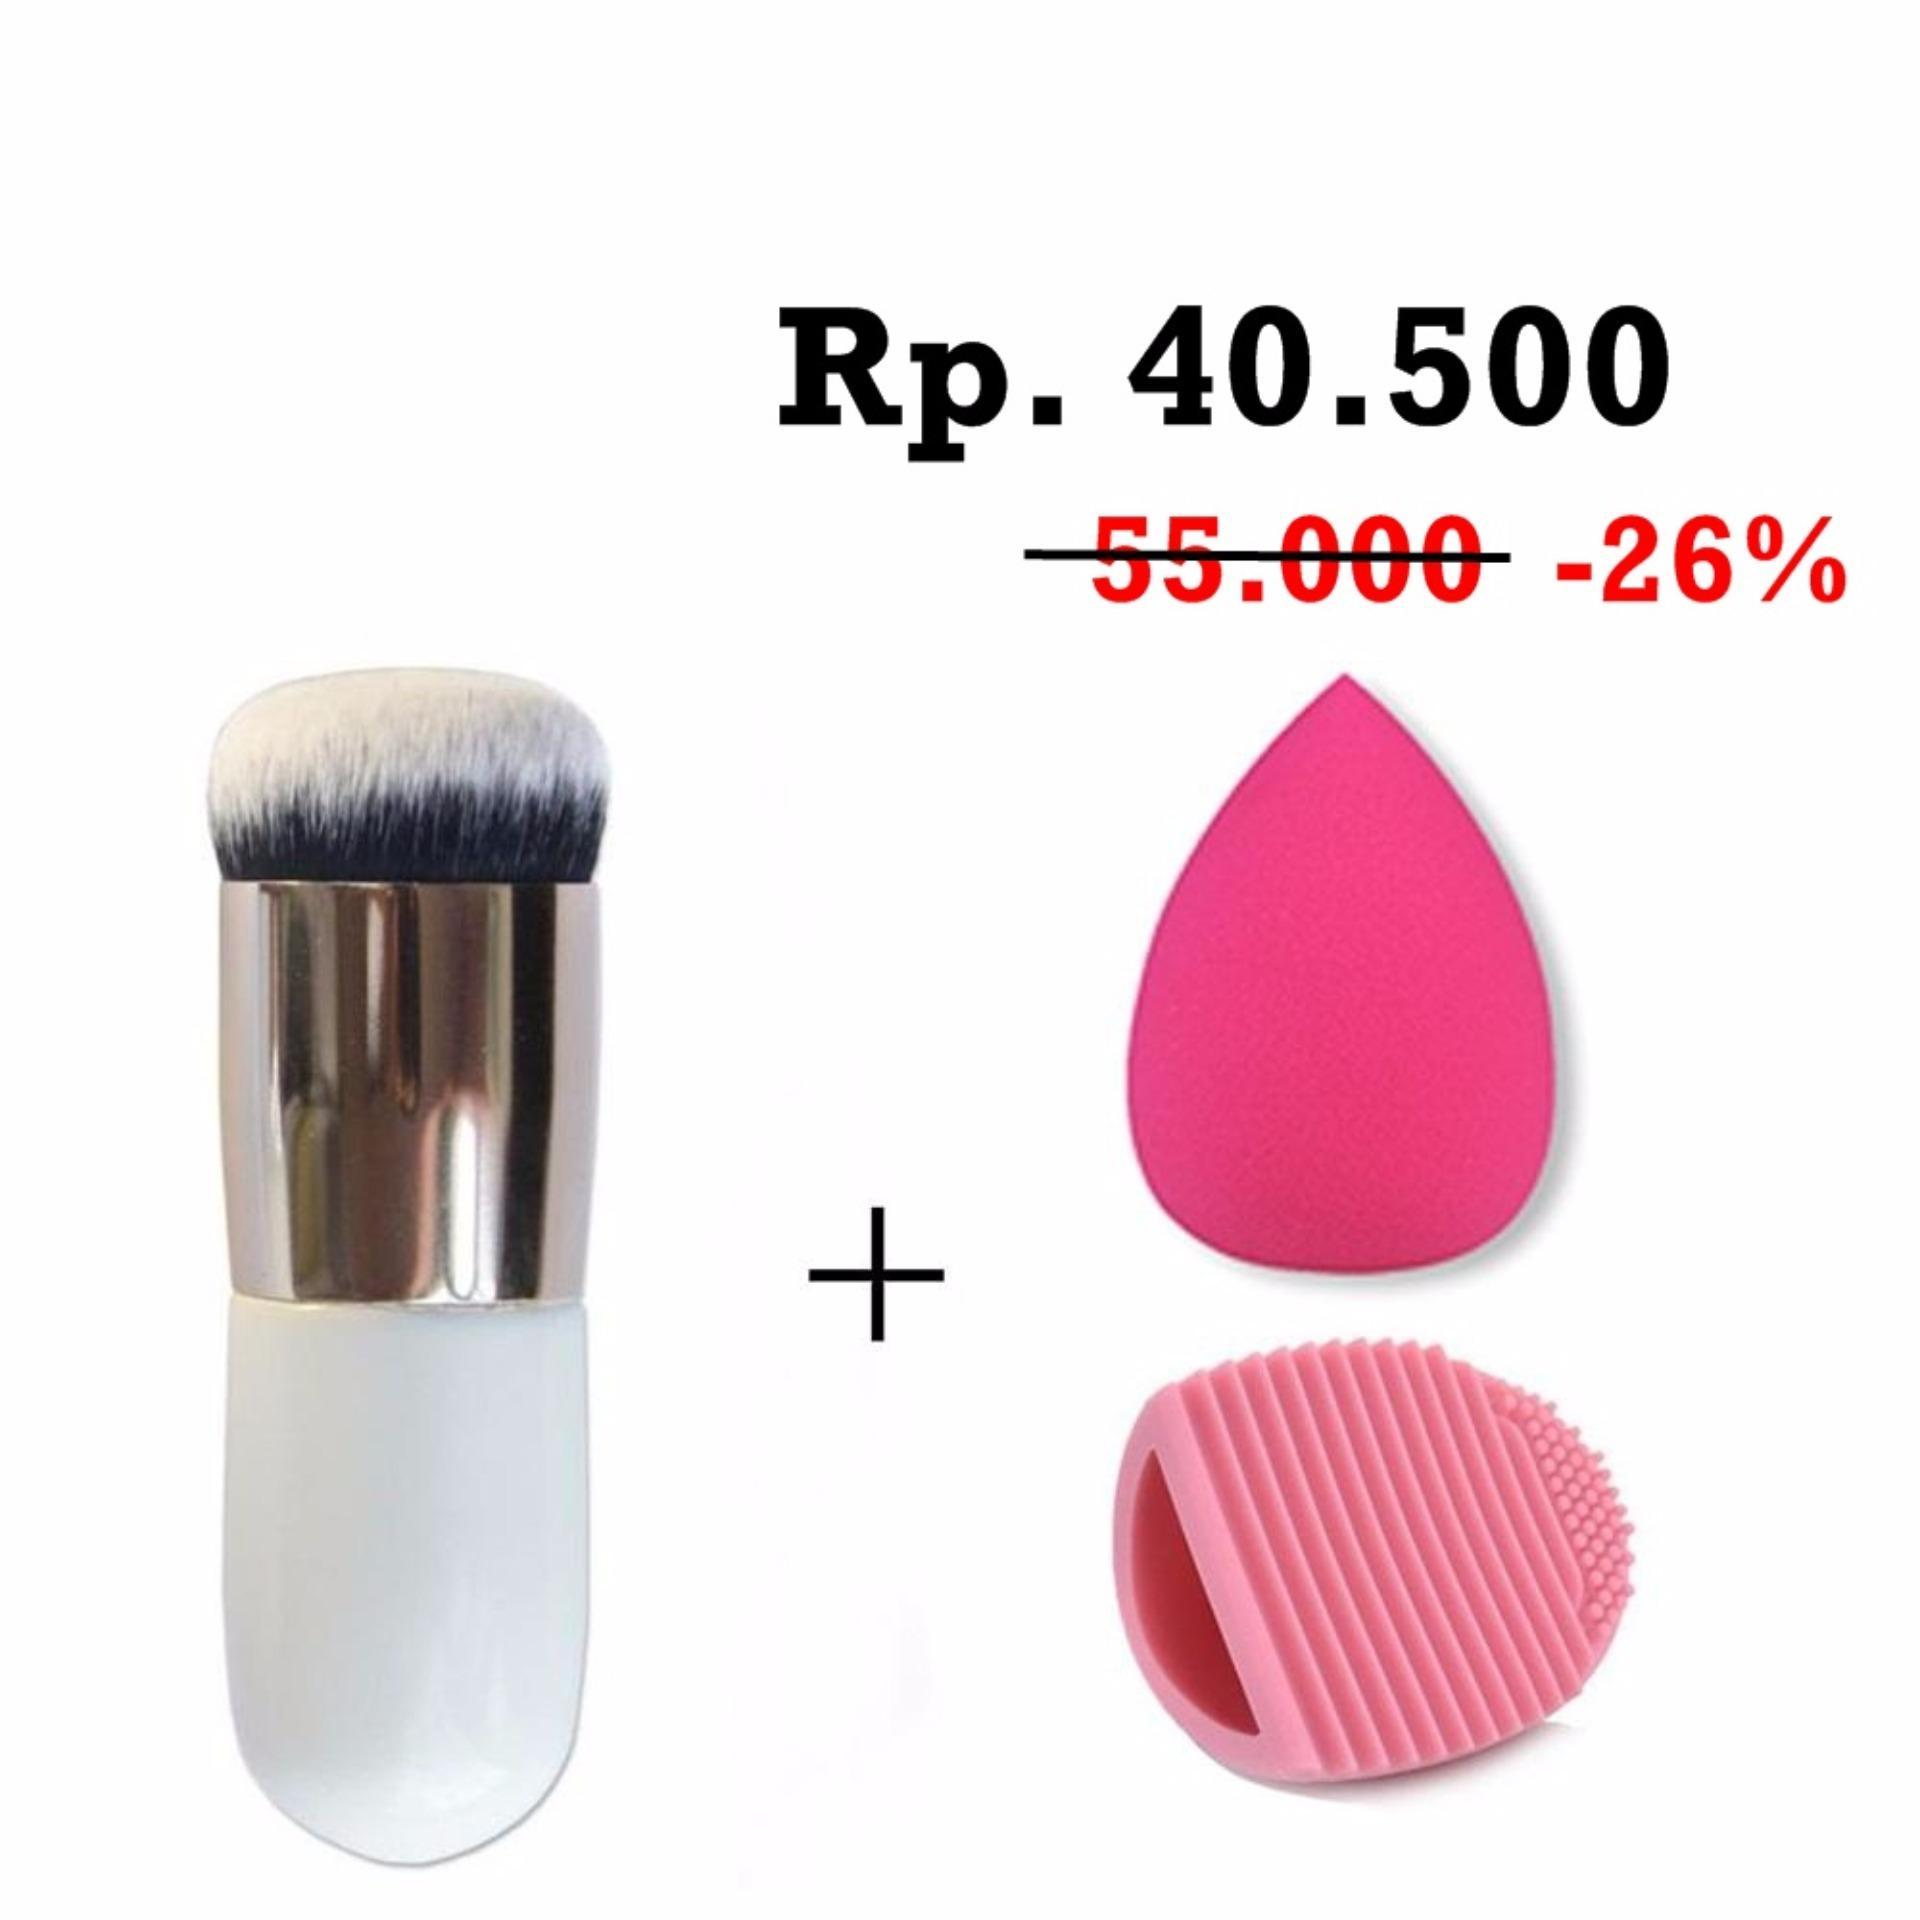 Buy Sell Cheapest Spon Beauty Make Best Quality Product Deals Spons Bedak Isi 2 Jbs New York Makeup Brush Bundle Kuas Up Set Chuby Pier Silver Egg